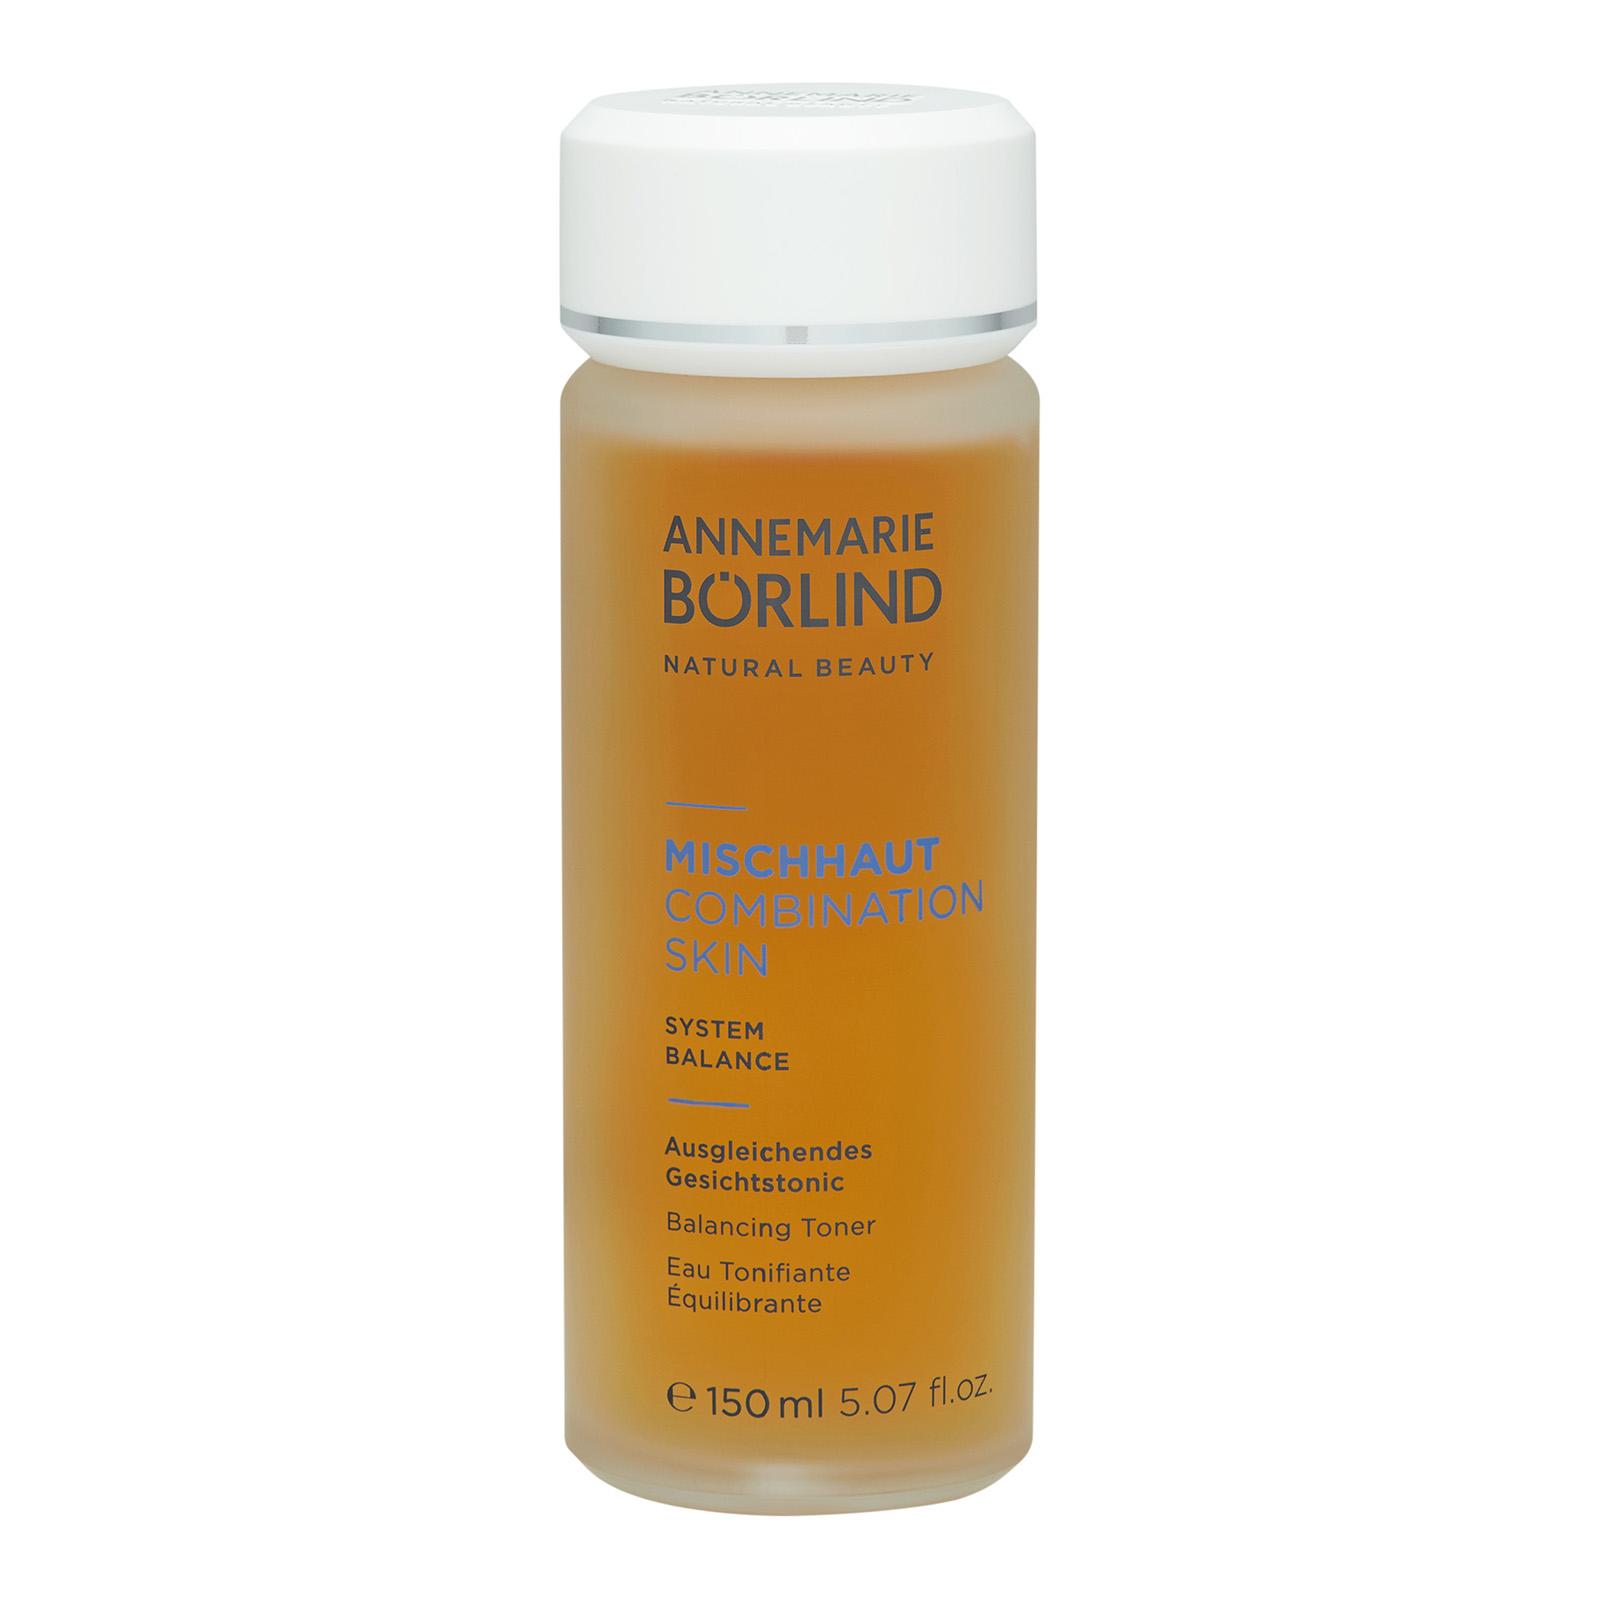 Annemarie Borlind Combination Skin Facial Toner 5.07oz, 150ml ABX0100095-000-00